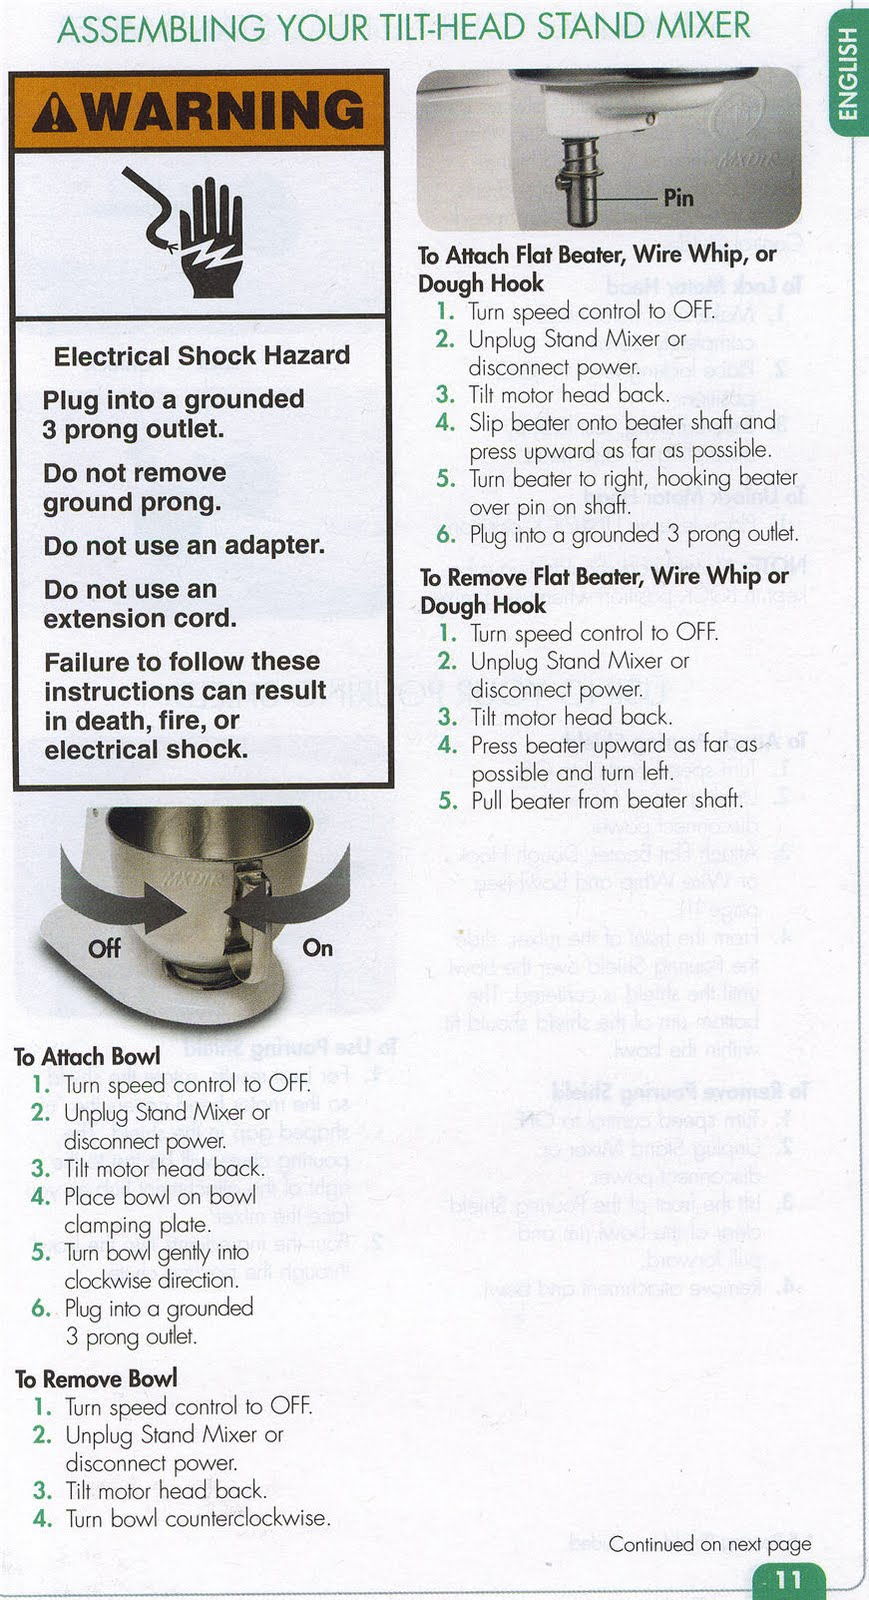 kitchenaid stand mixer instructions manual kitchenaid mixer k45ss instruction manual kitchenaid mixer instruction manual download